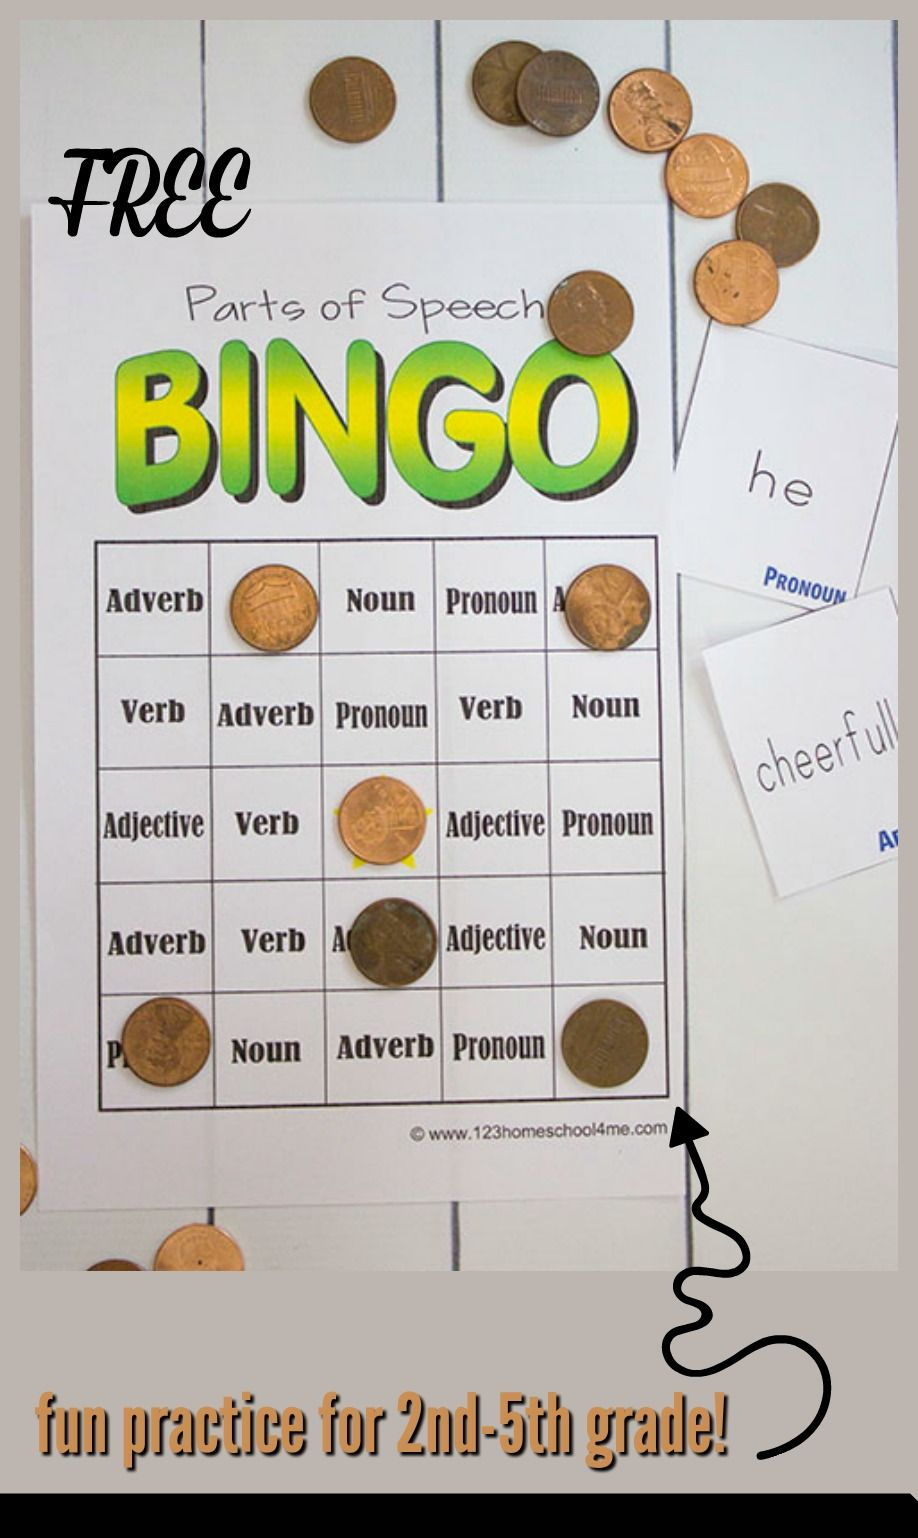 Free Parts Of Speech Game   Kindergarten   Parts Of Speech, Parts Of - Free Printable Parts Of Speech Bingo